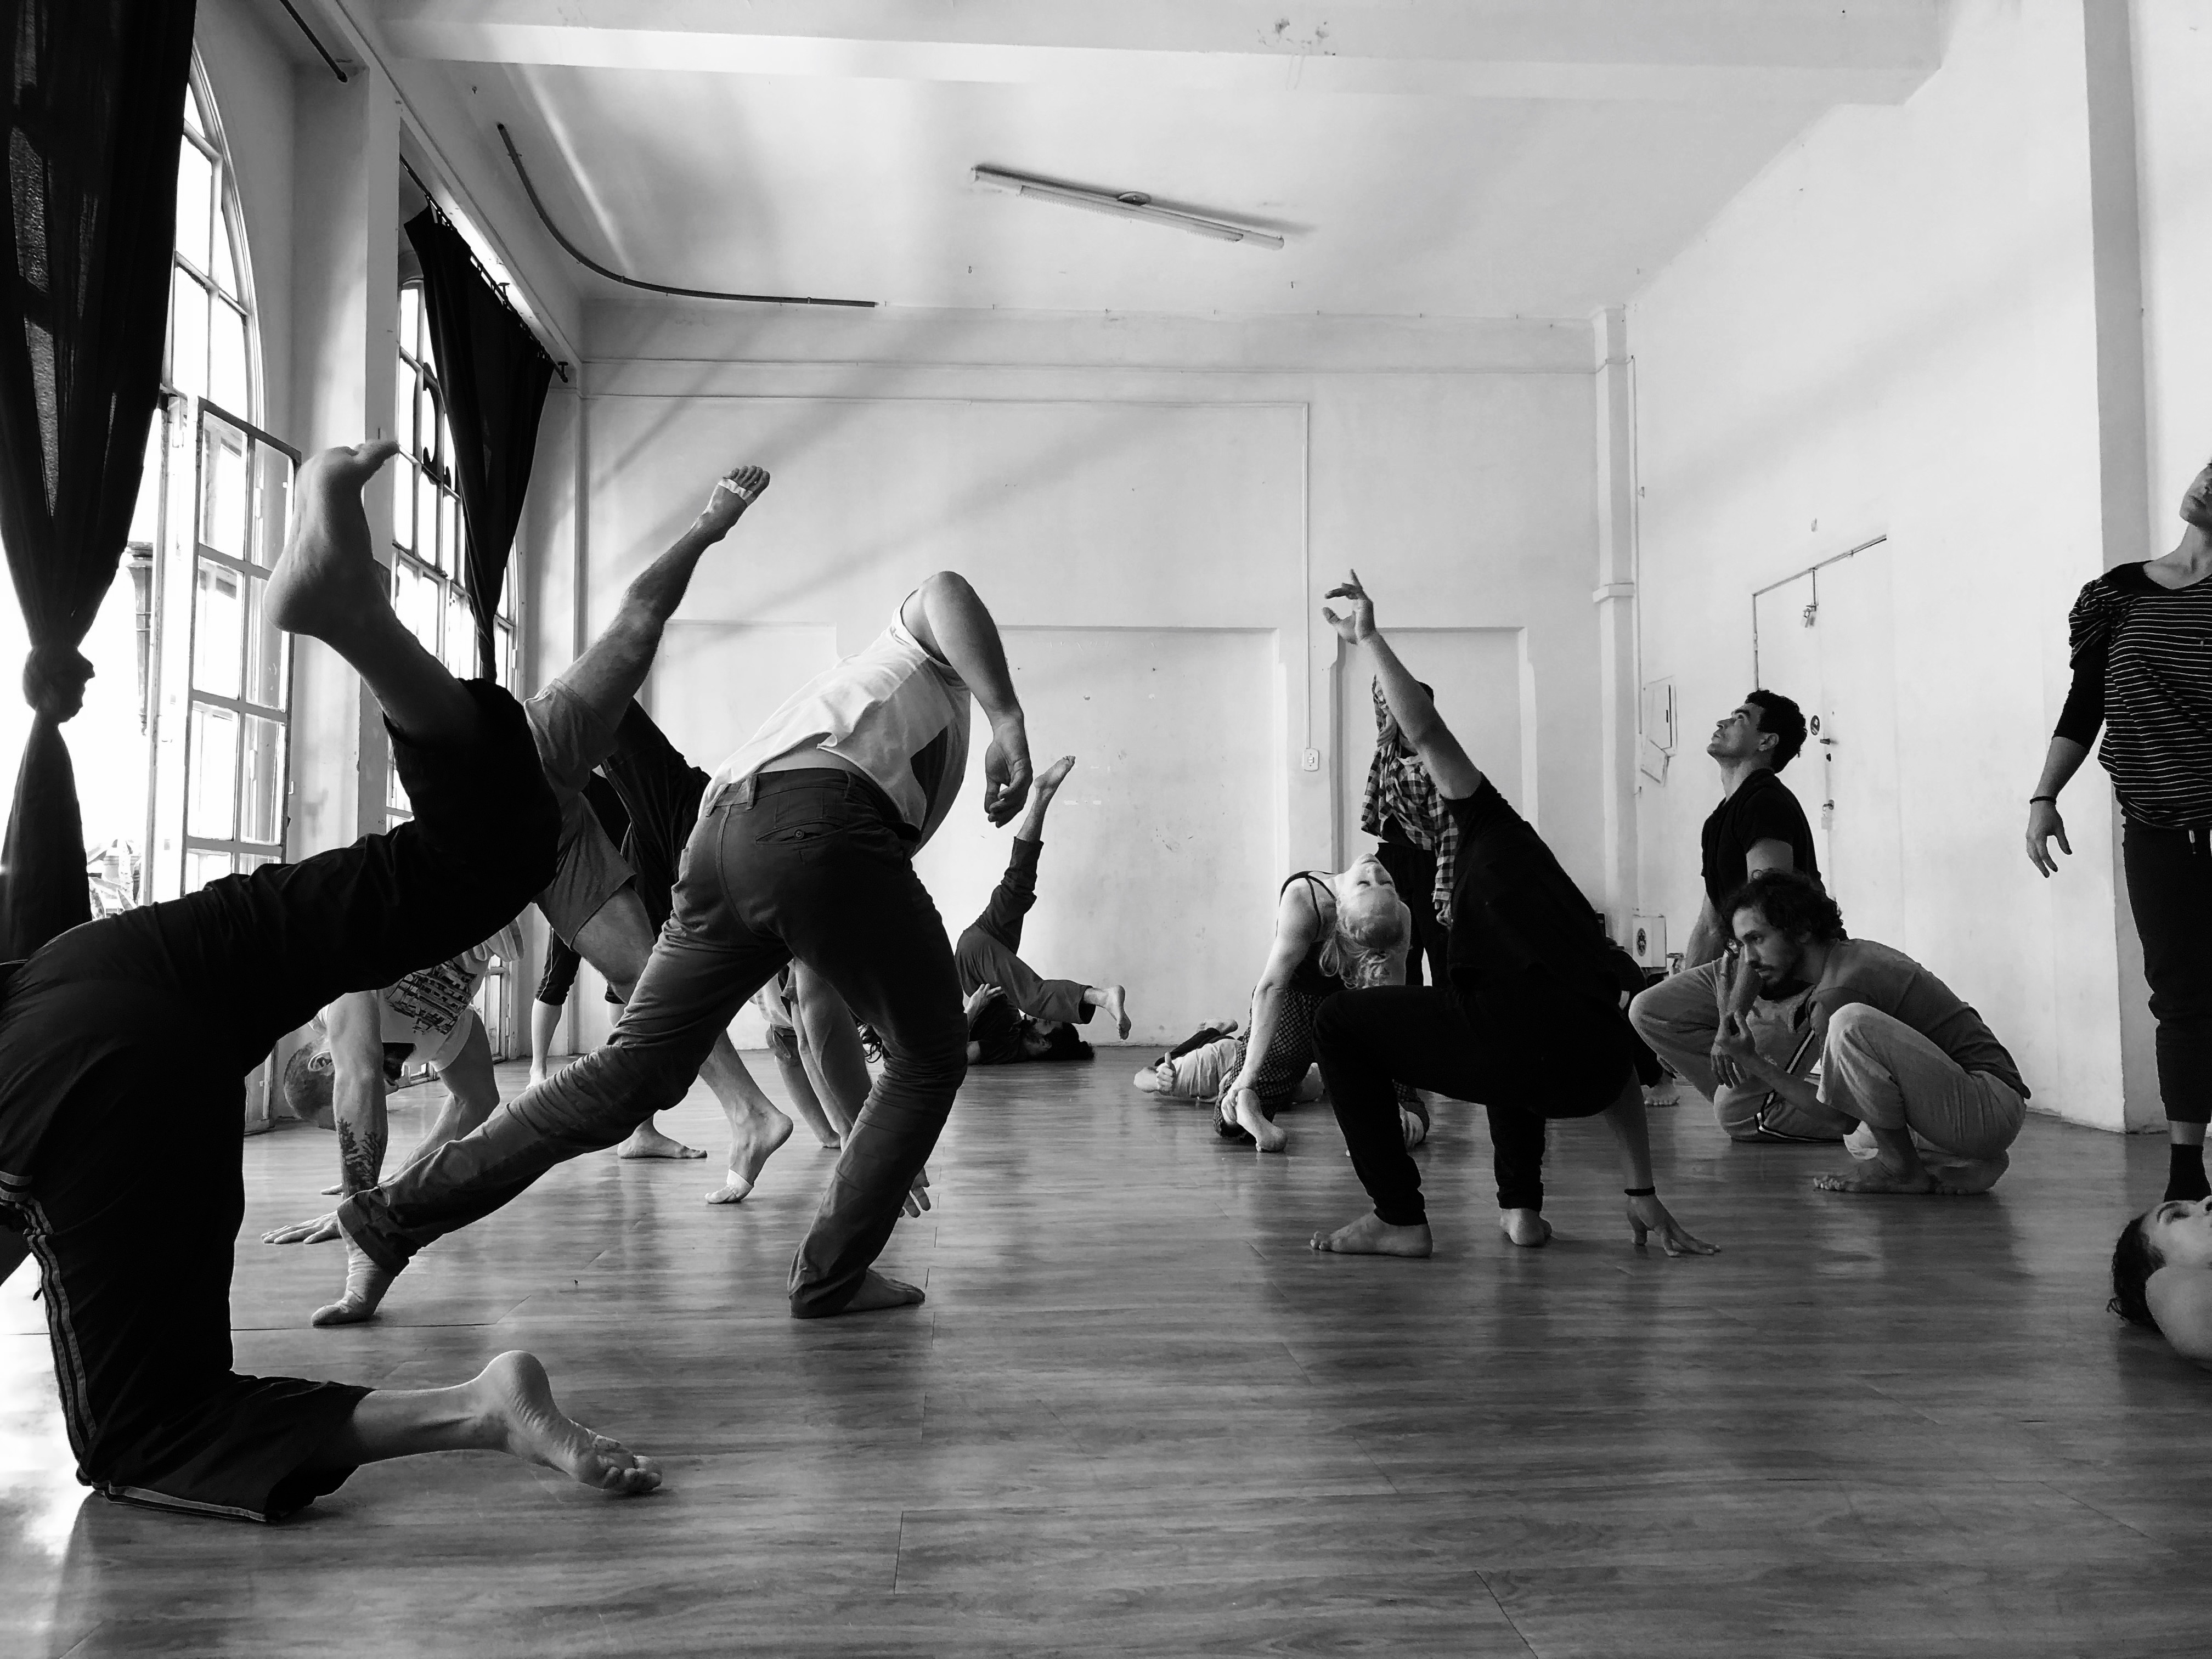 Workshop in Rio de Janeiro